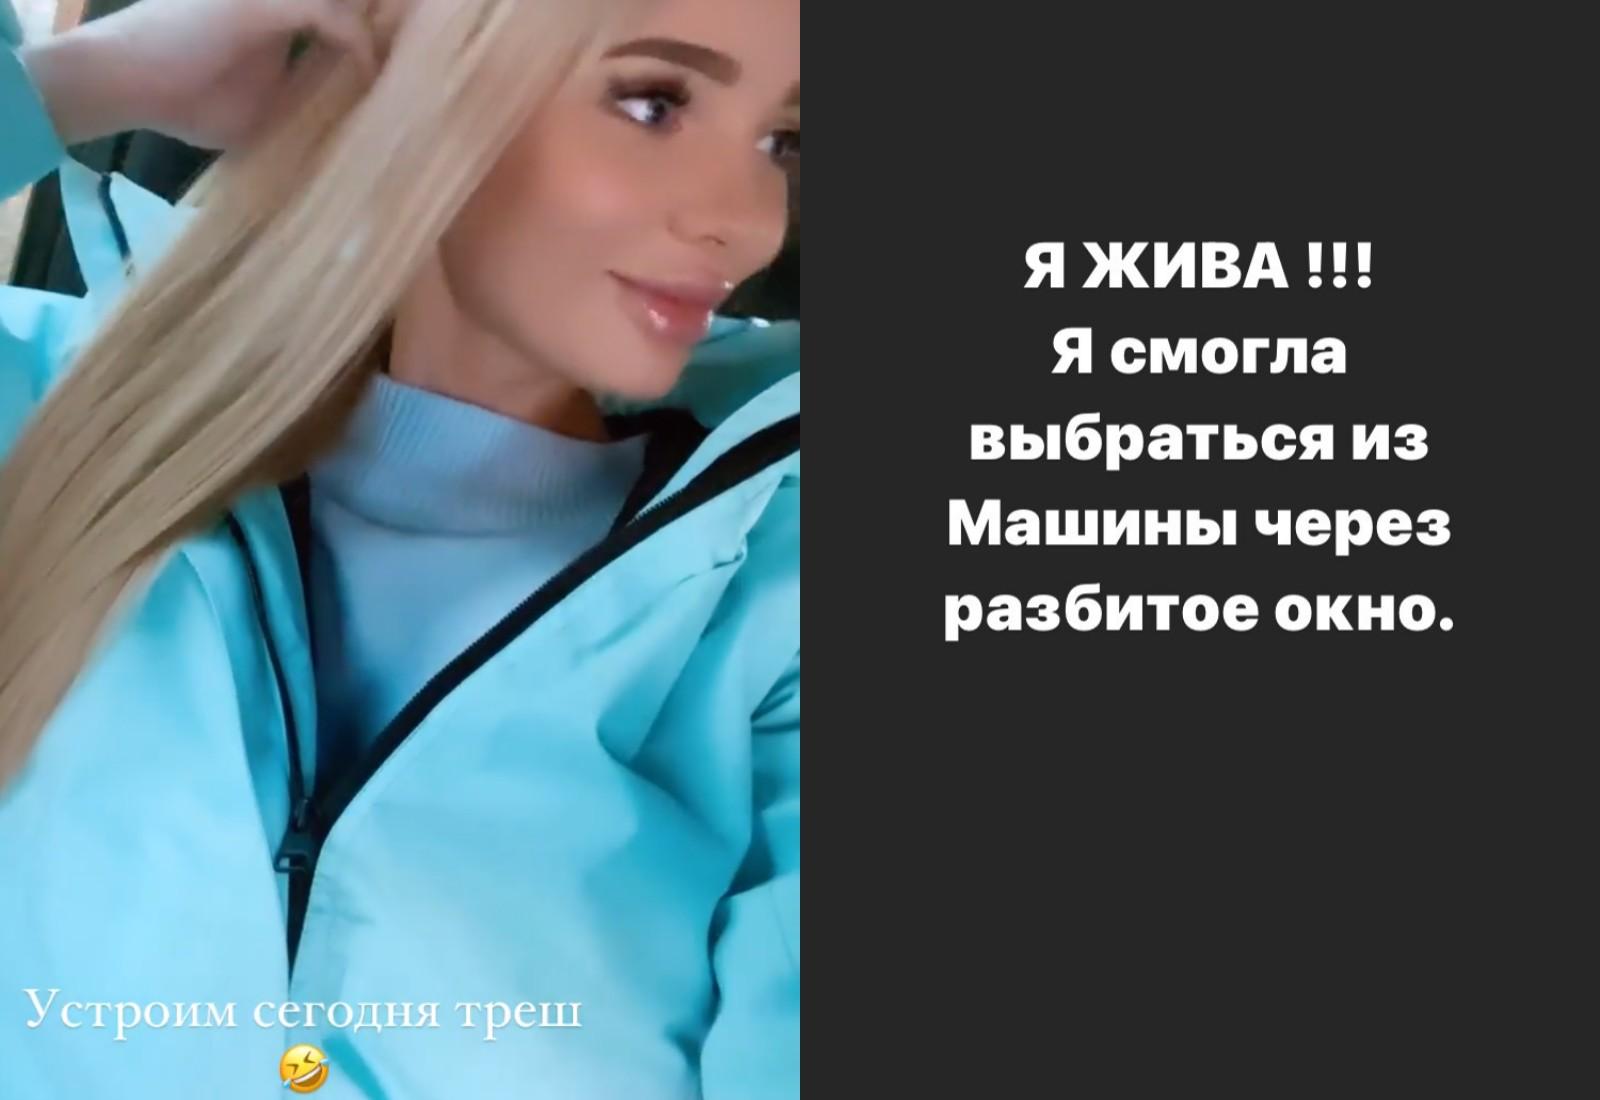 Дарья Корнилова. Фото © Instagram / kornilova.dasha